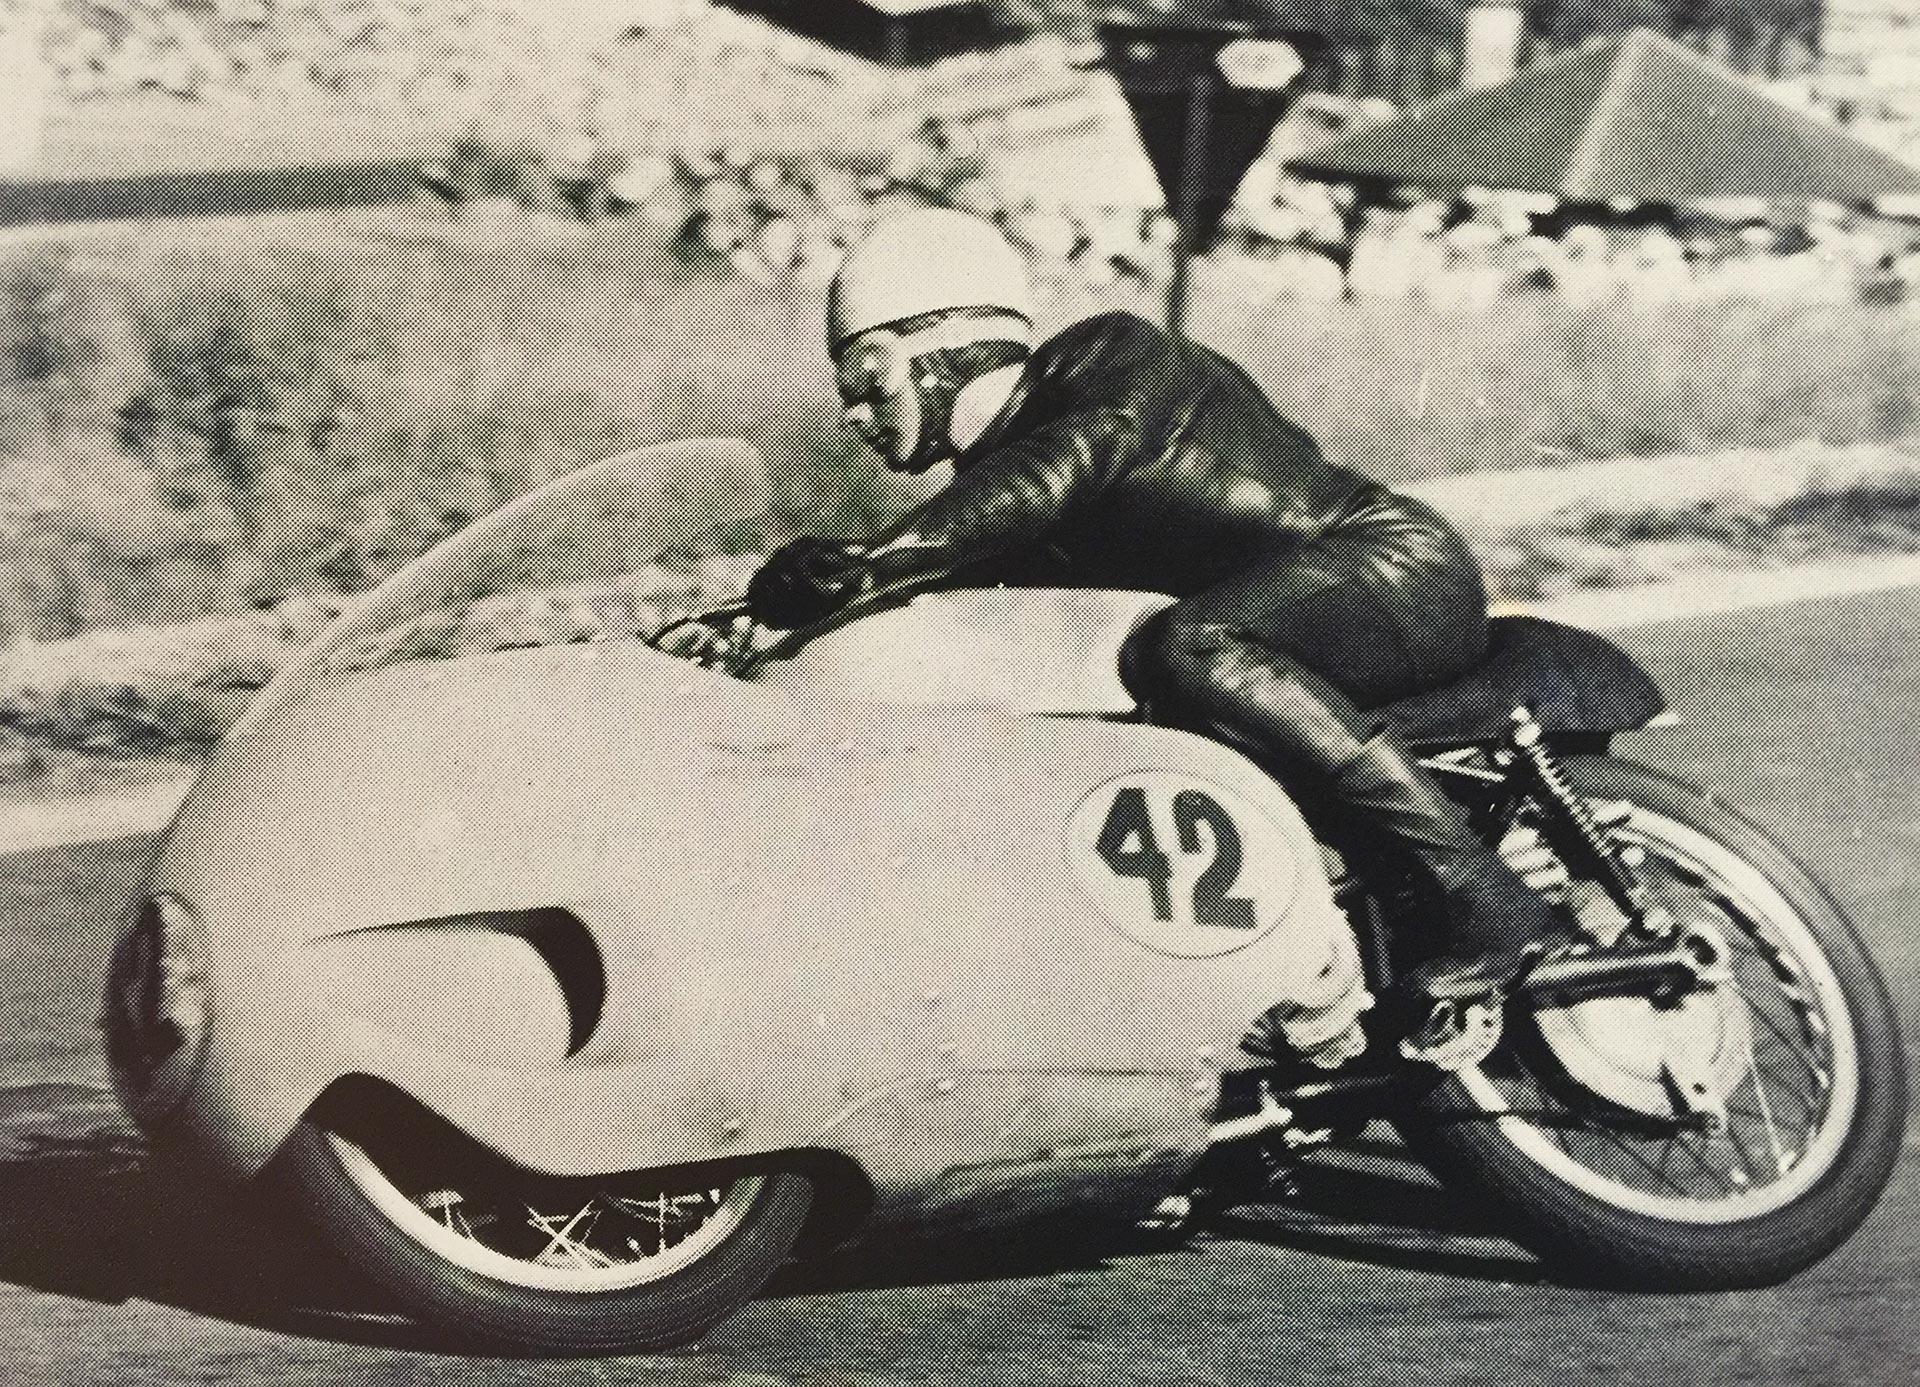 Moto Guzzi V8 | 300km/h in 1957 on a 500cc 4-stroke